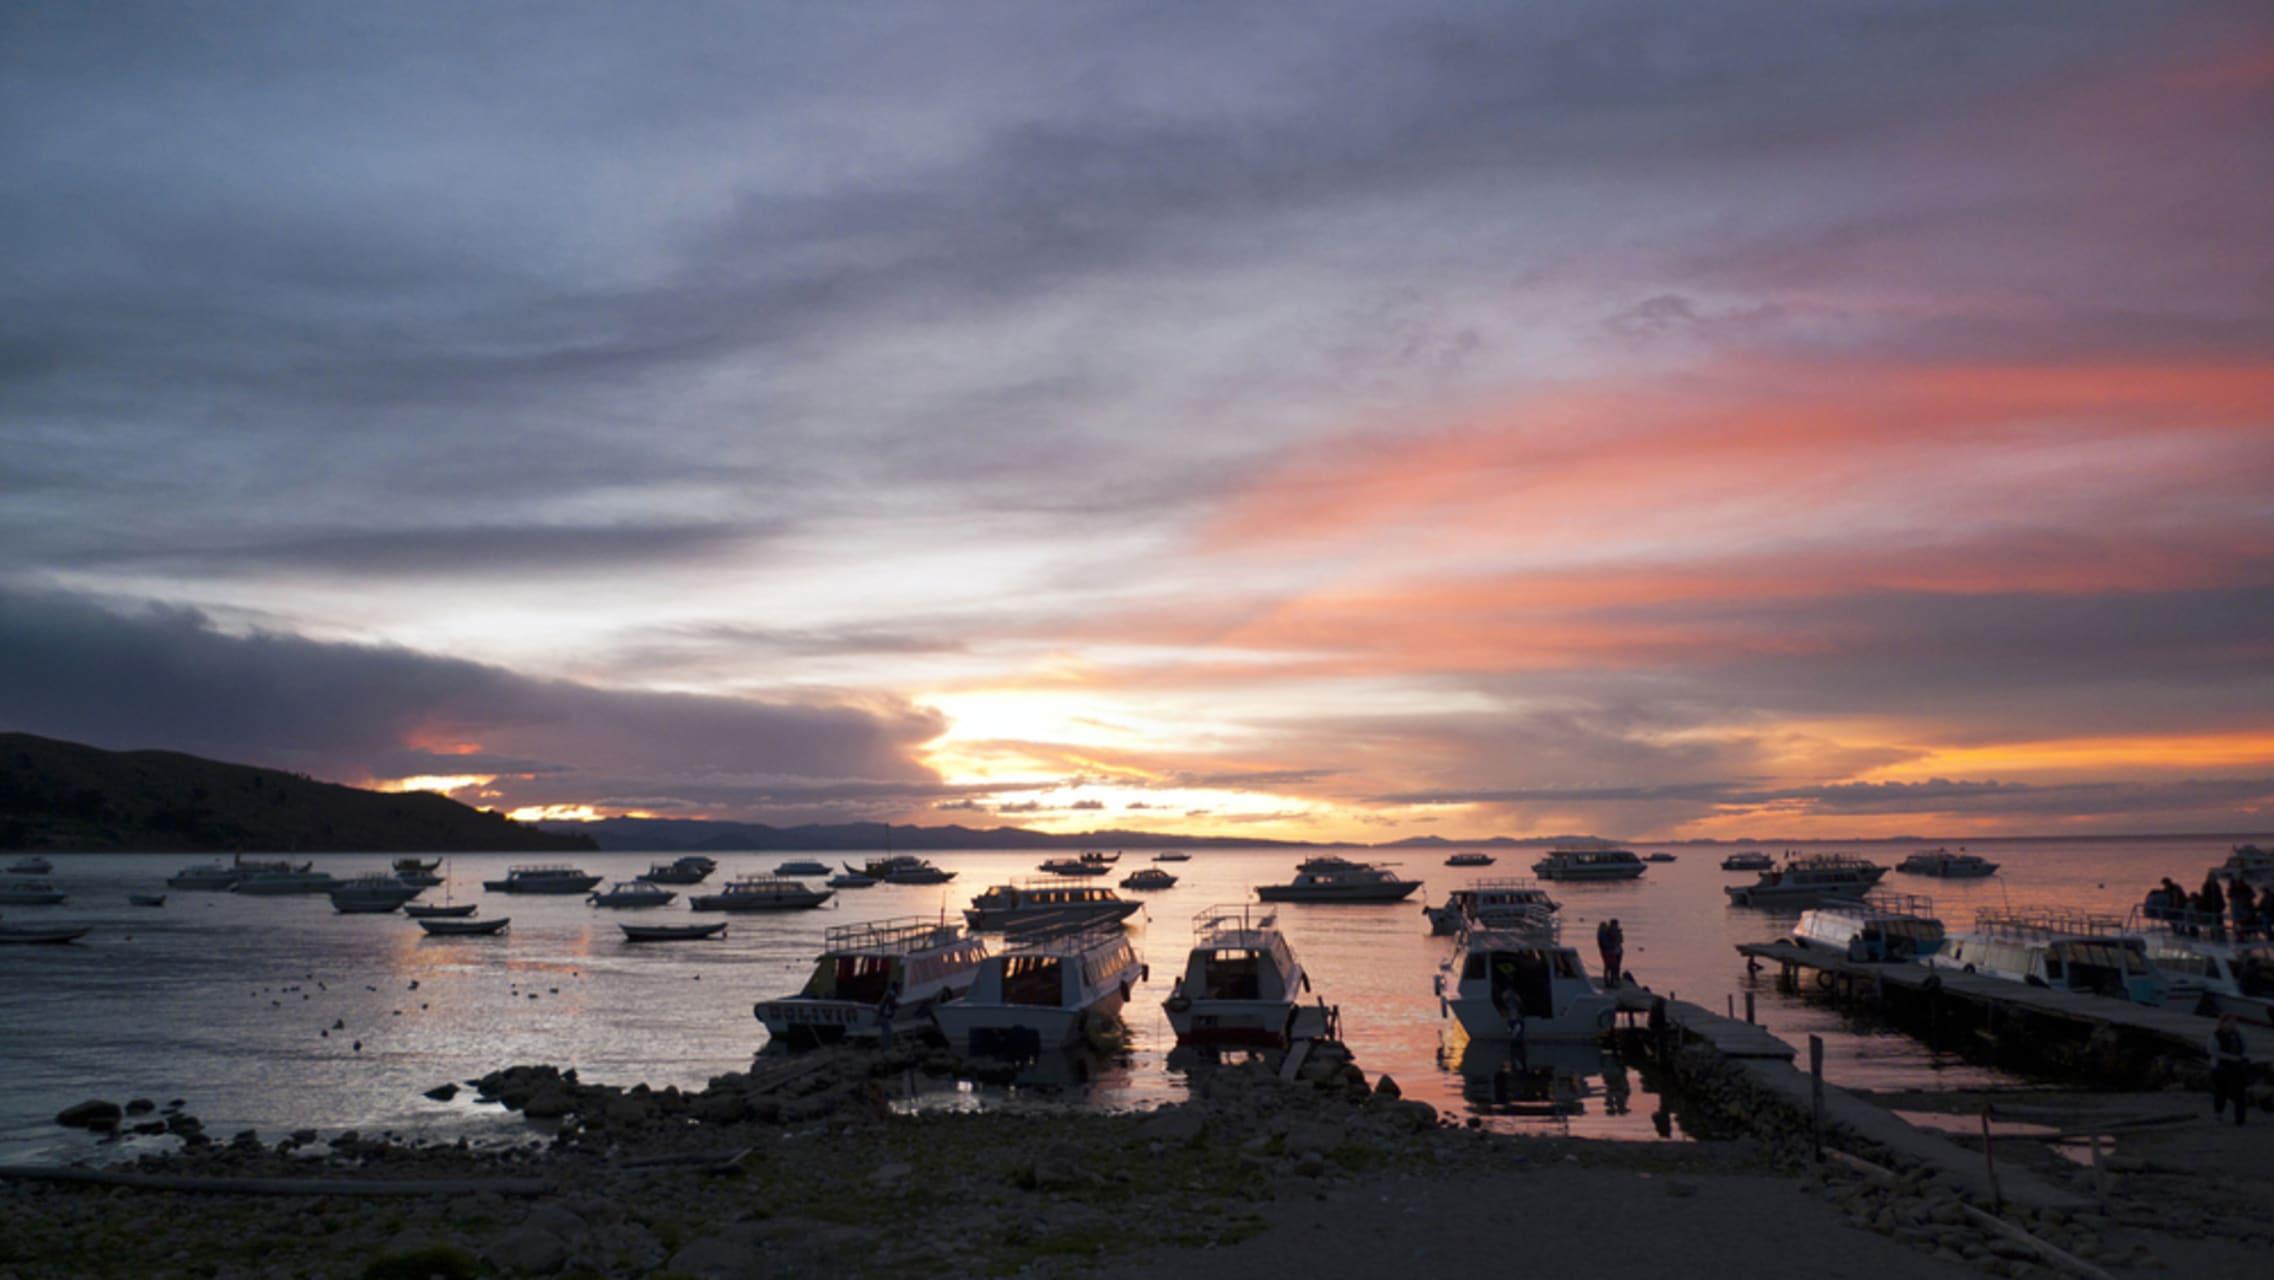 Lake Titicaca - Bolivia - Sunset over Titicaca Lake